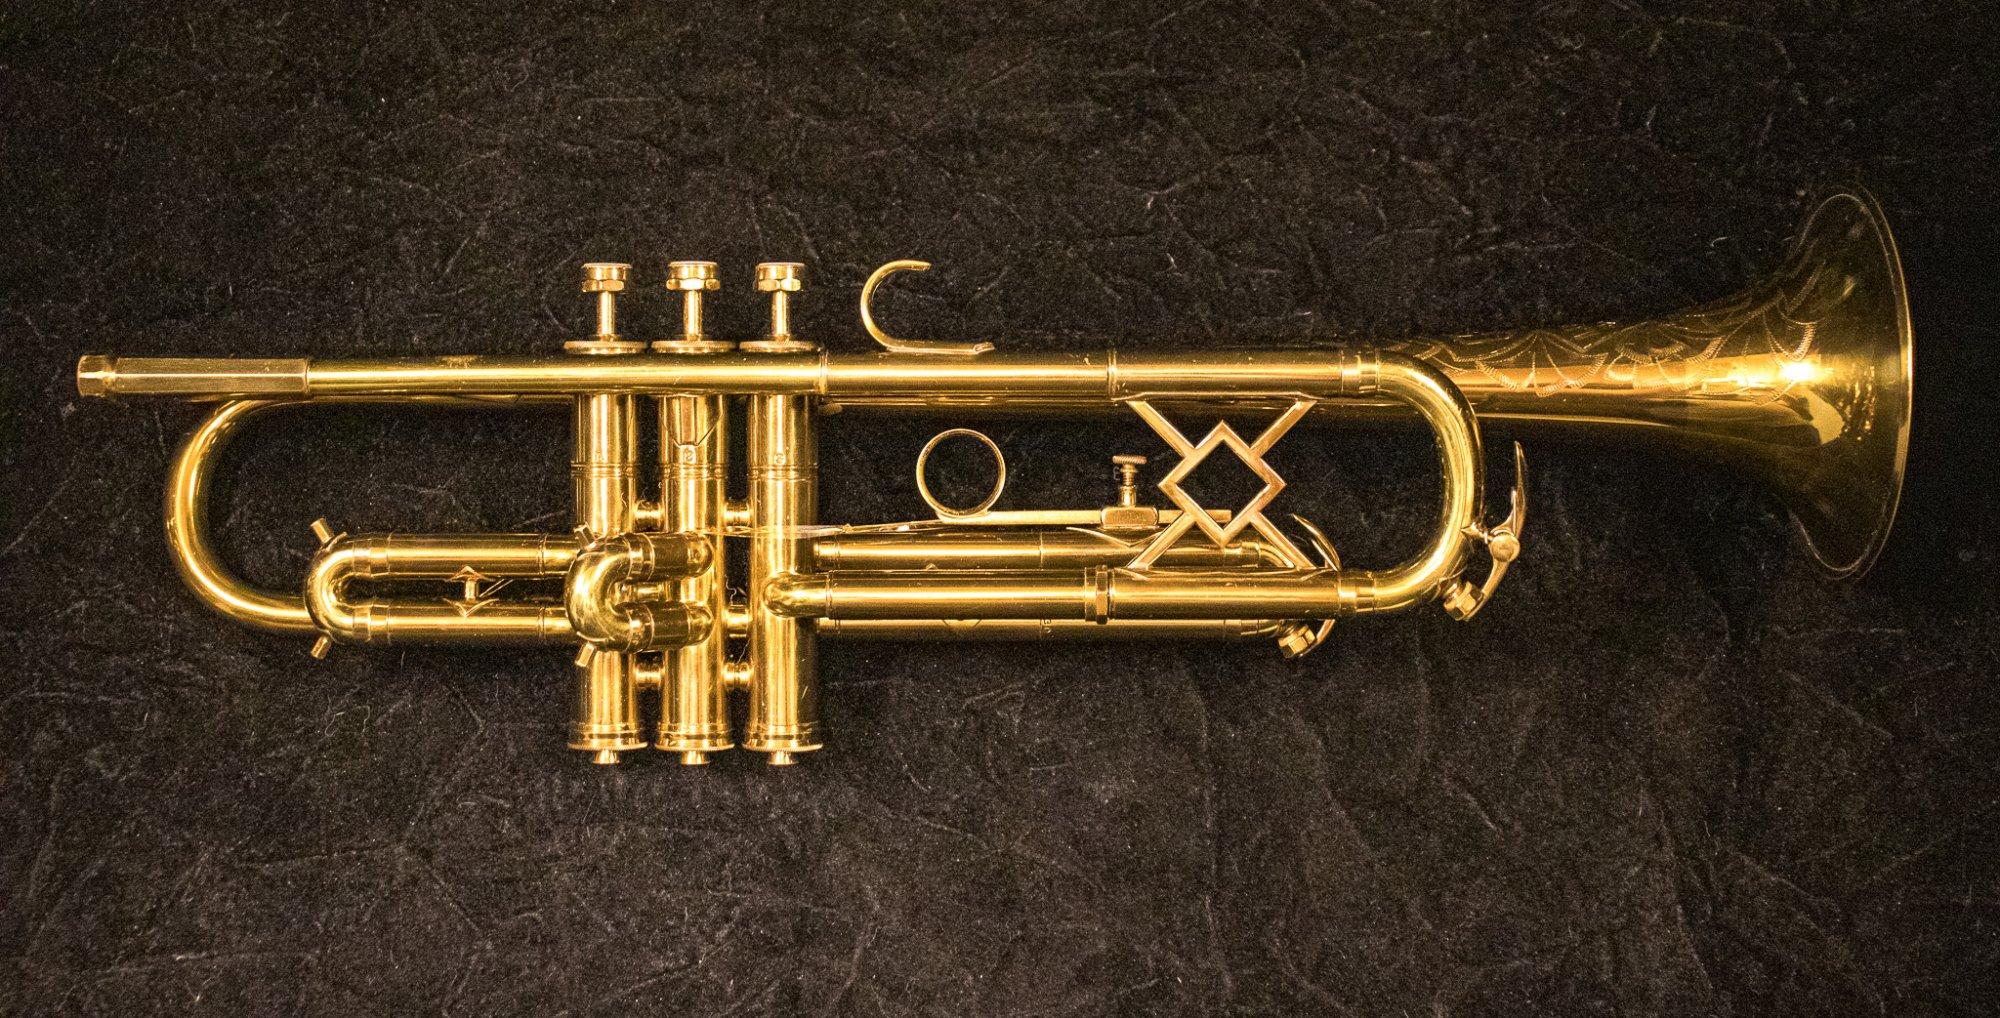 1942 King Liberty II Trumpet